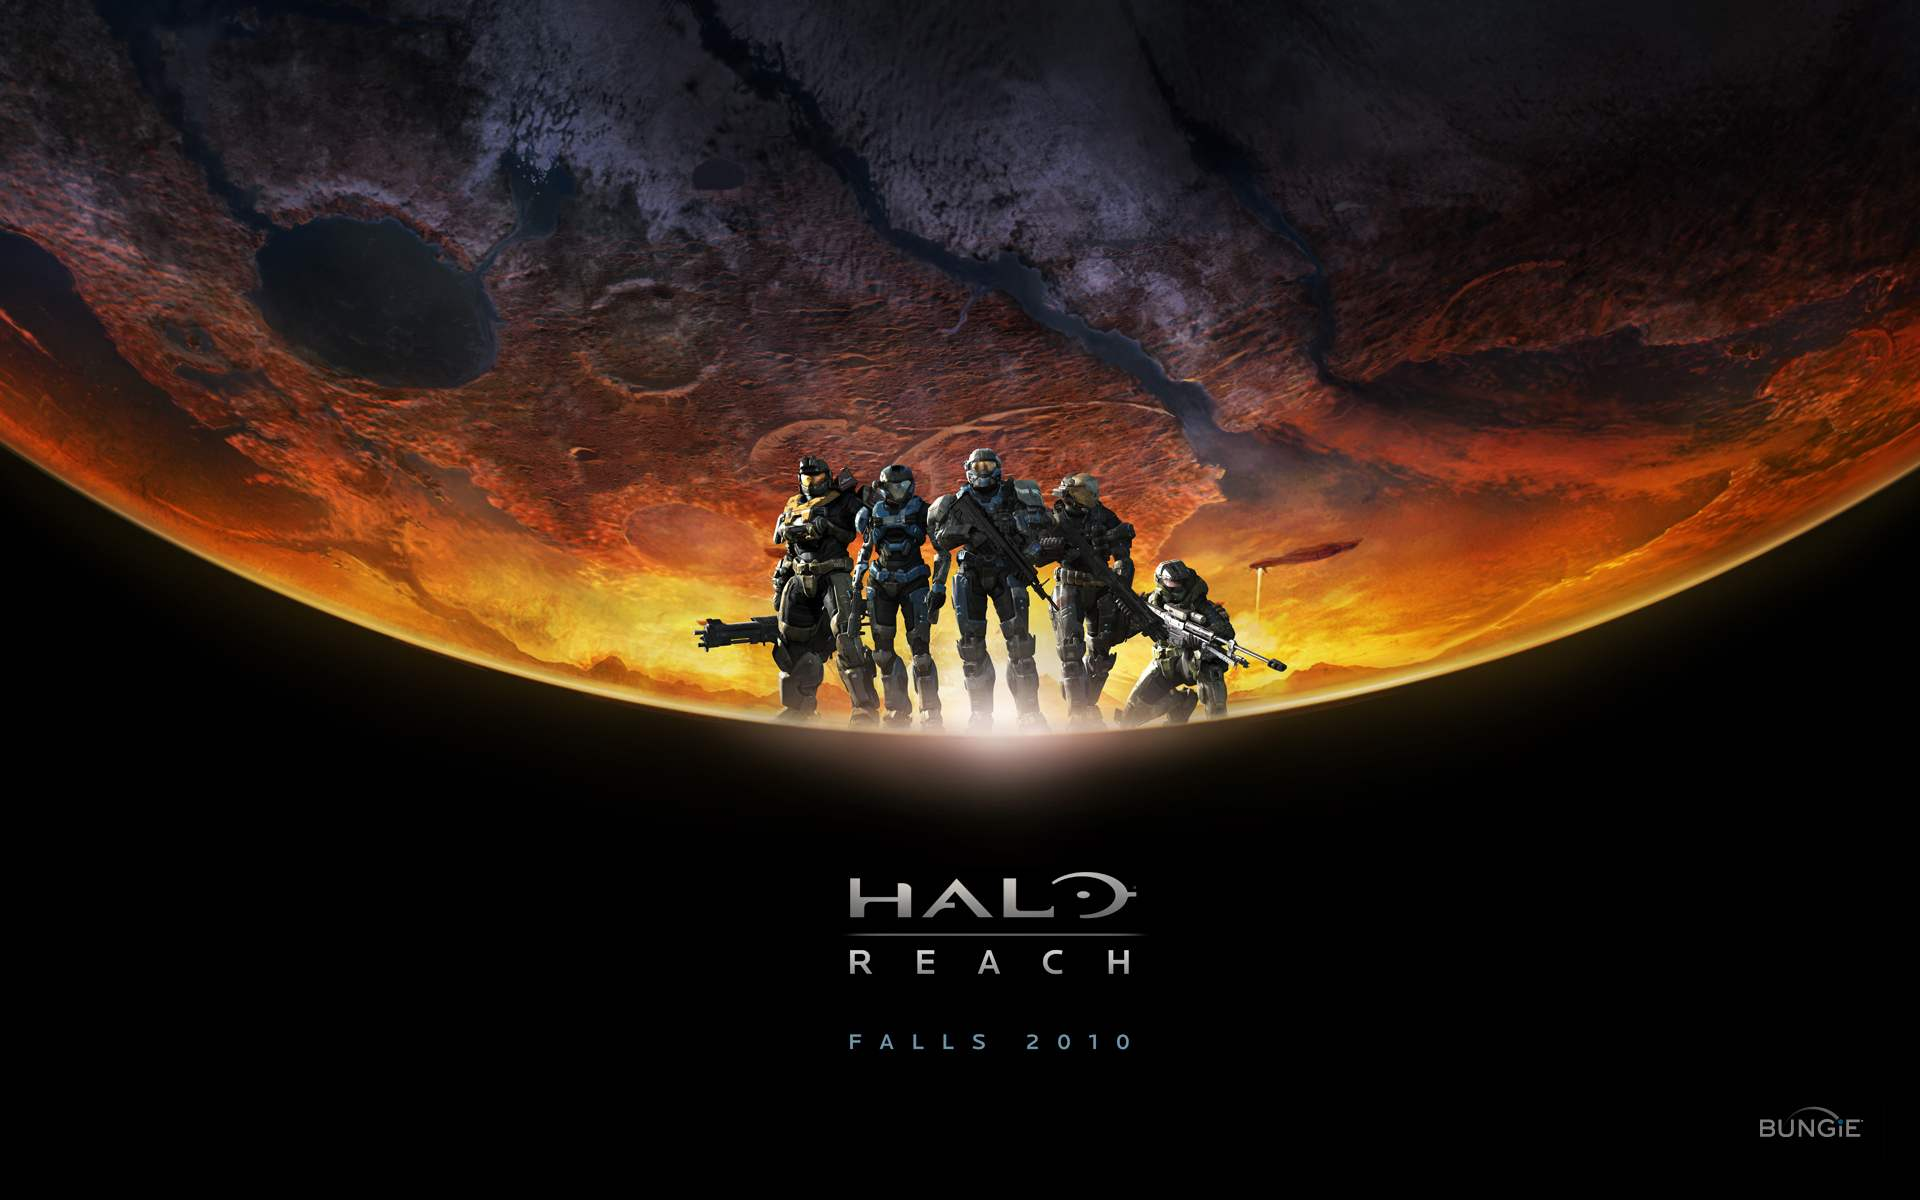 Halo Reach 1080p Wallpaper Halo Reach 720p Wallpaper 1920x1200